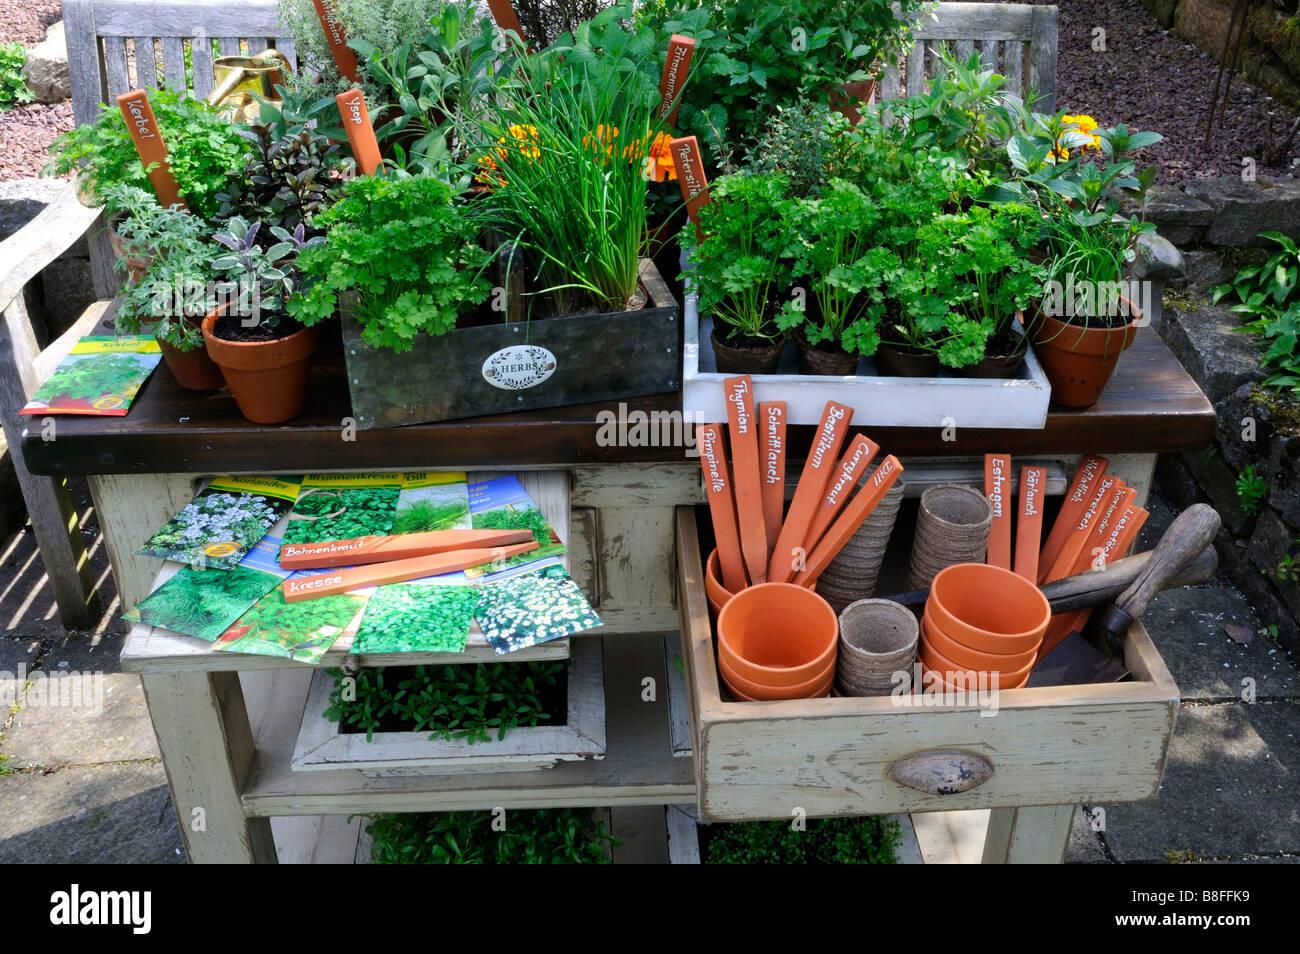 Herb plants - Stock Image